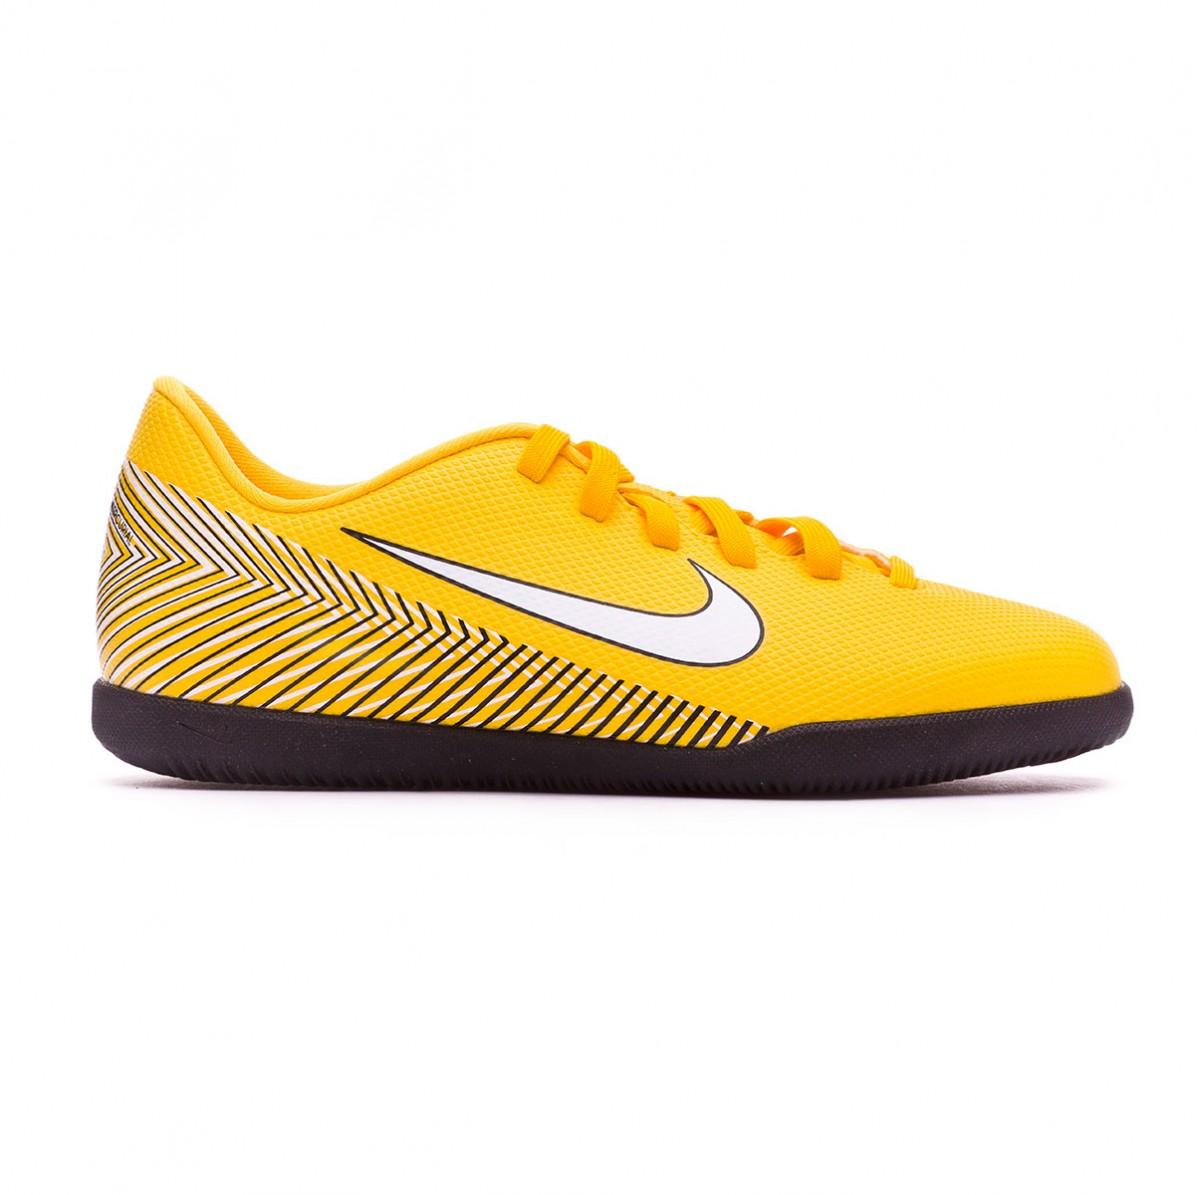 reputable site f28e7 aa8f2 Futsal Boot Nike Kids Mercurial VaporX XII Club IC Neymar Yellow-Black -  Football store Fútbol Emotion